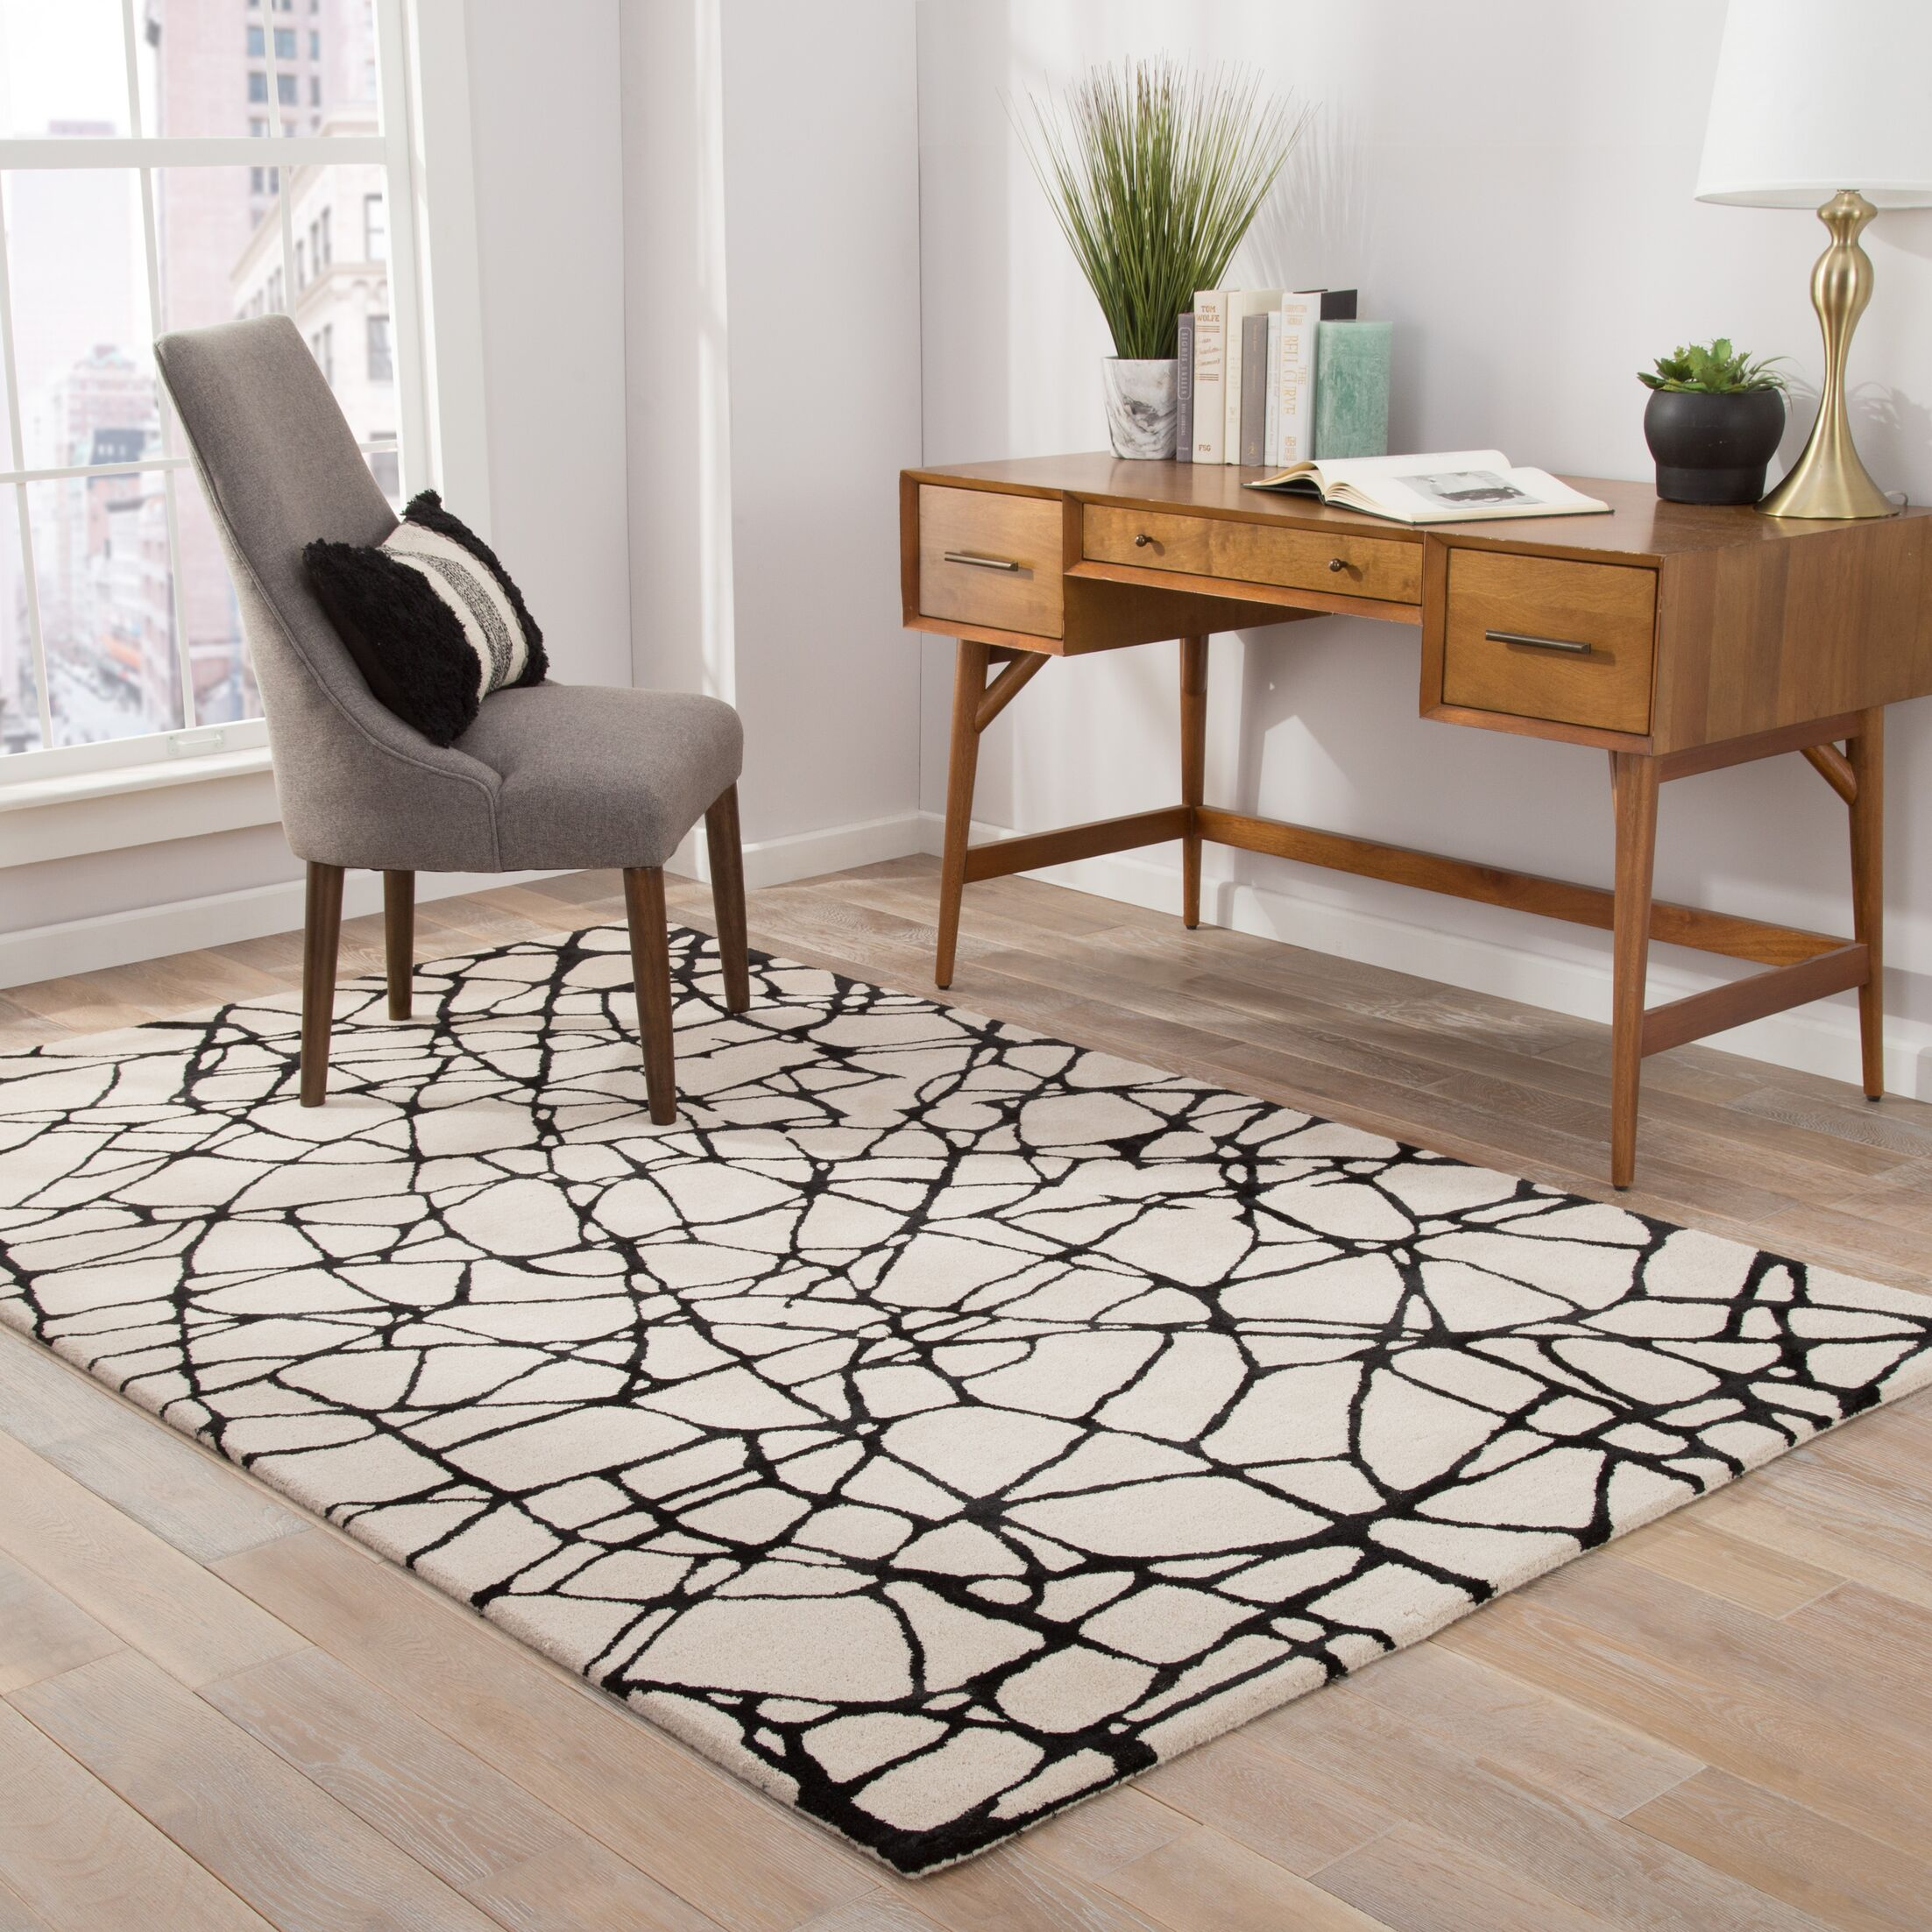 Keswick Hand-Tufted White Area Rug Rug Size: Rectangle 8' x 10'